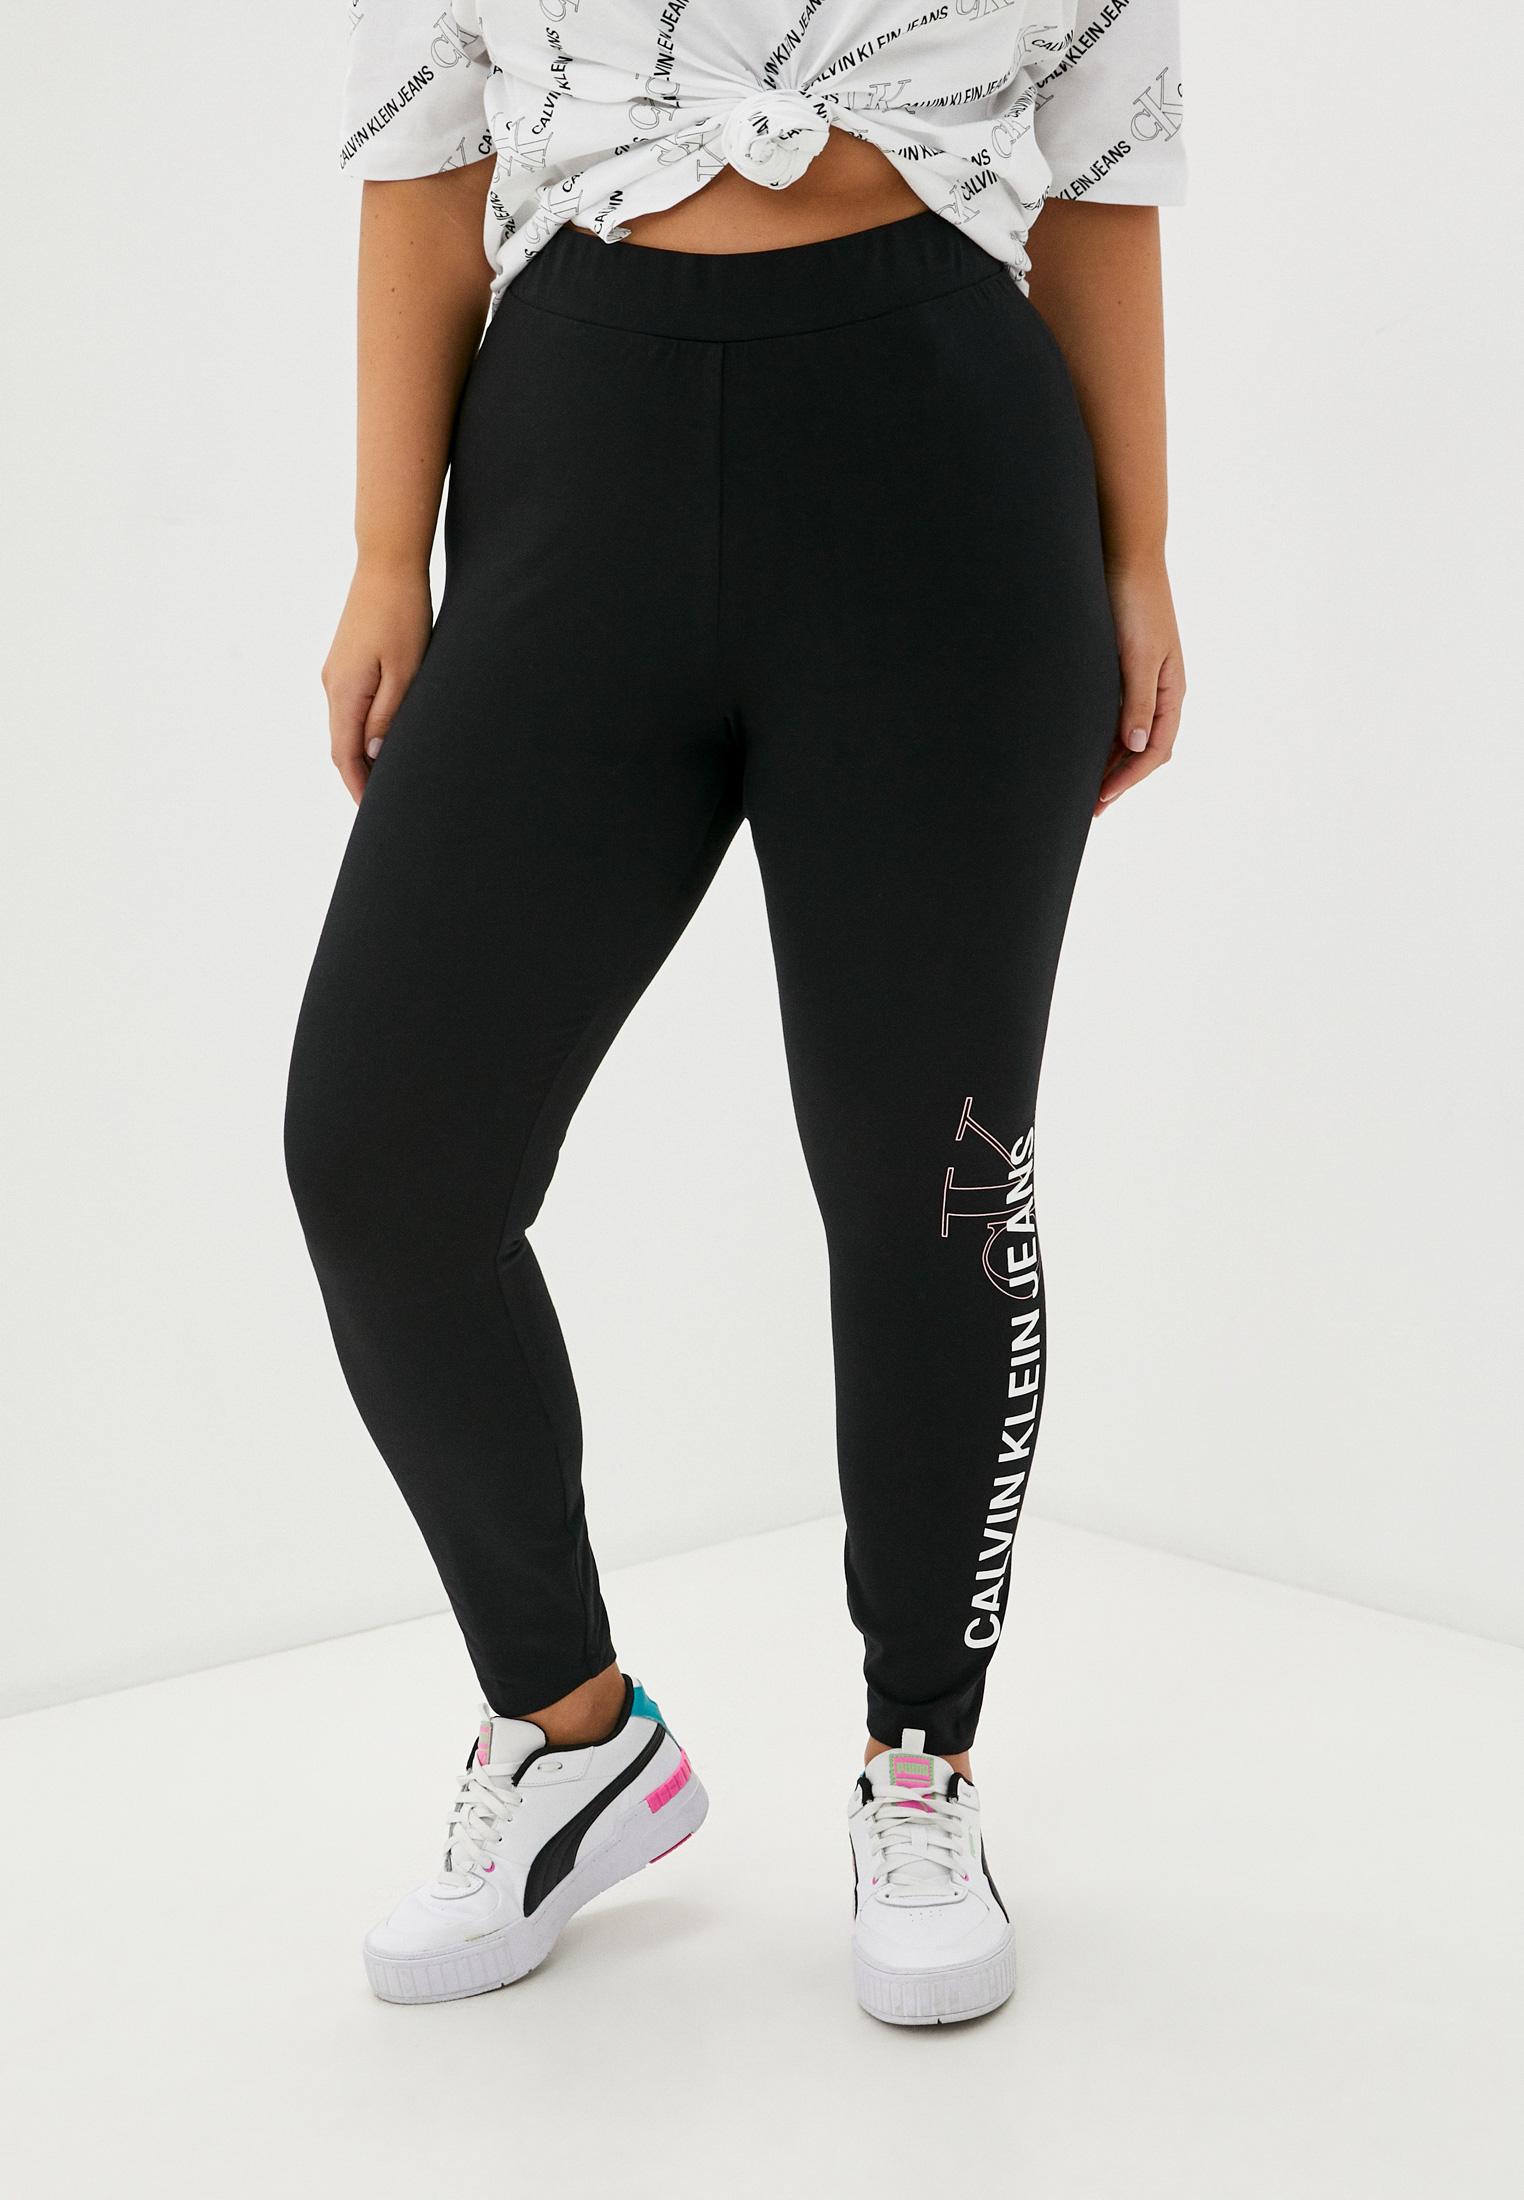 Женские леггинсы Calvin Klein Jeans Леггинсы Calvin Klein Jeans